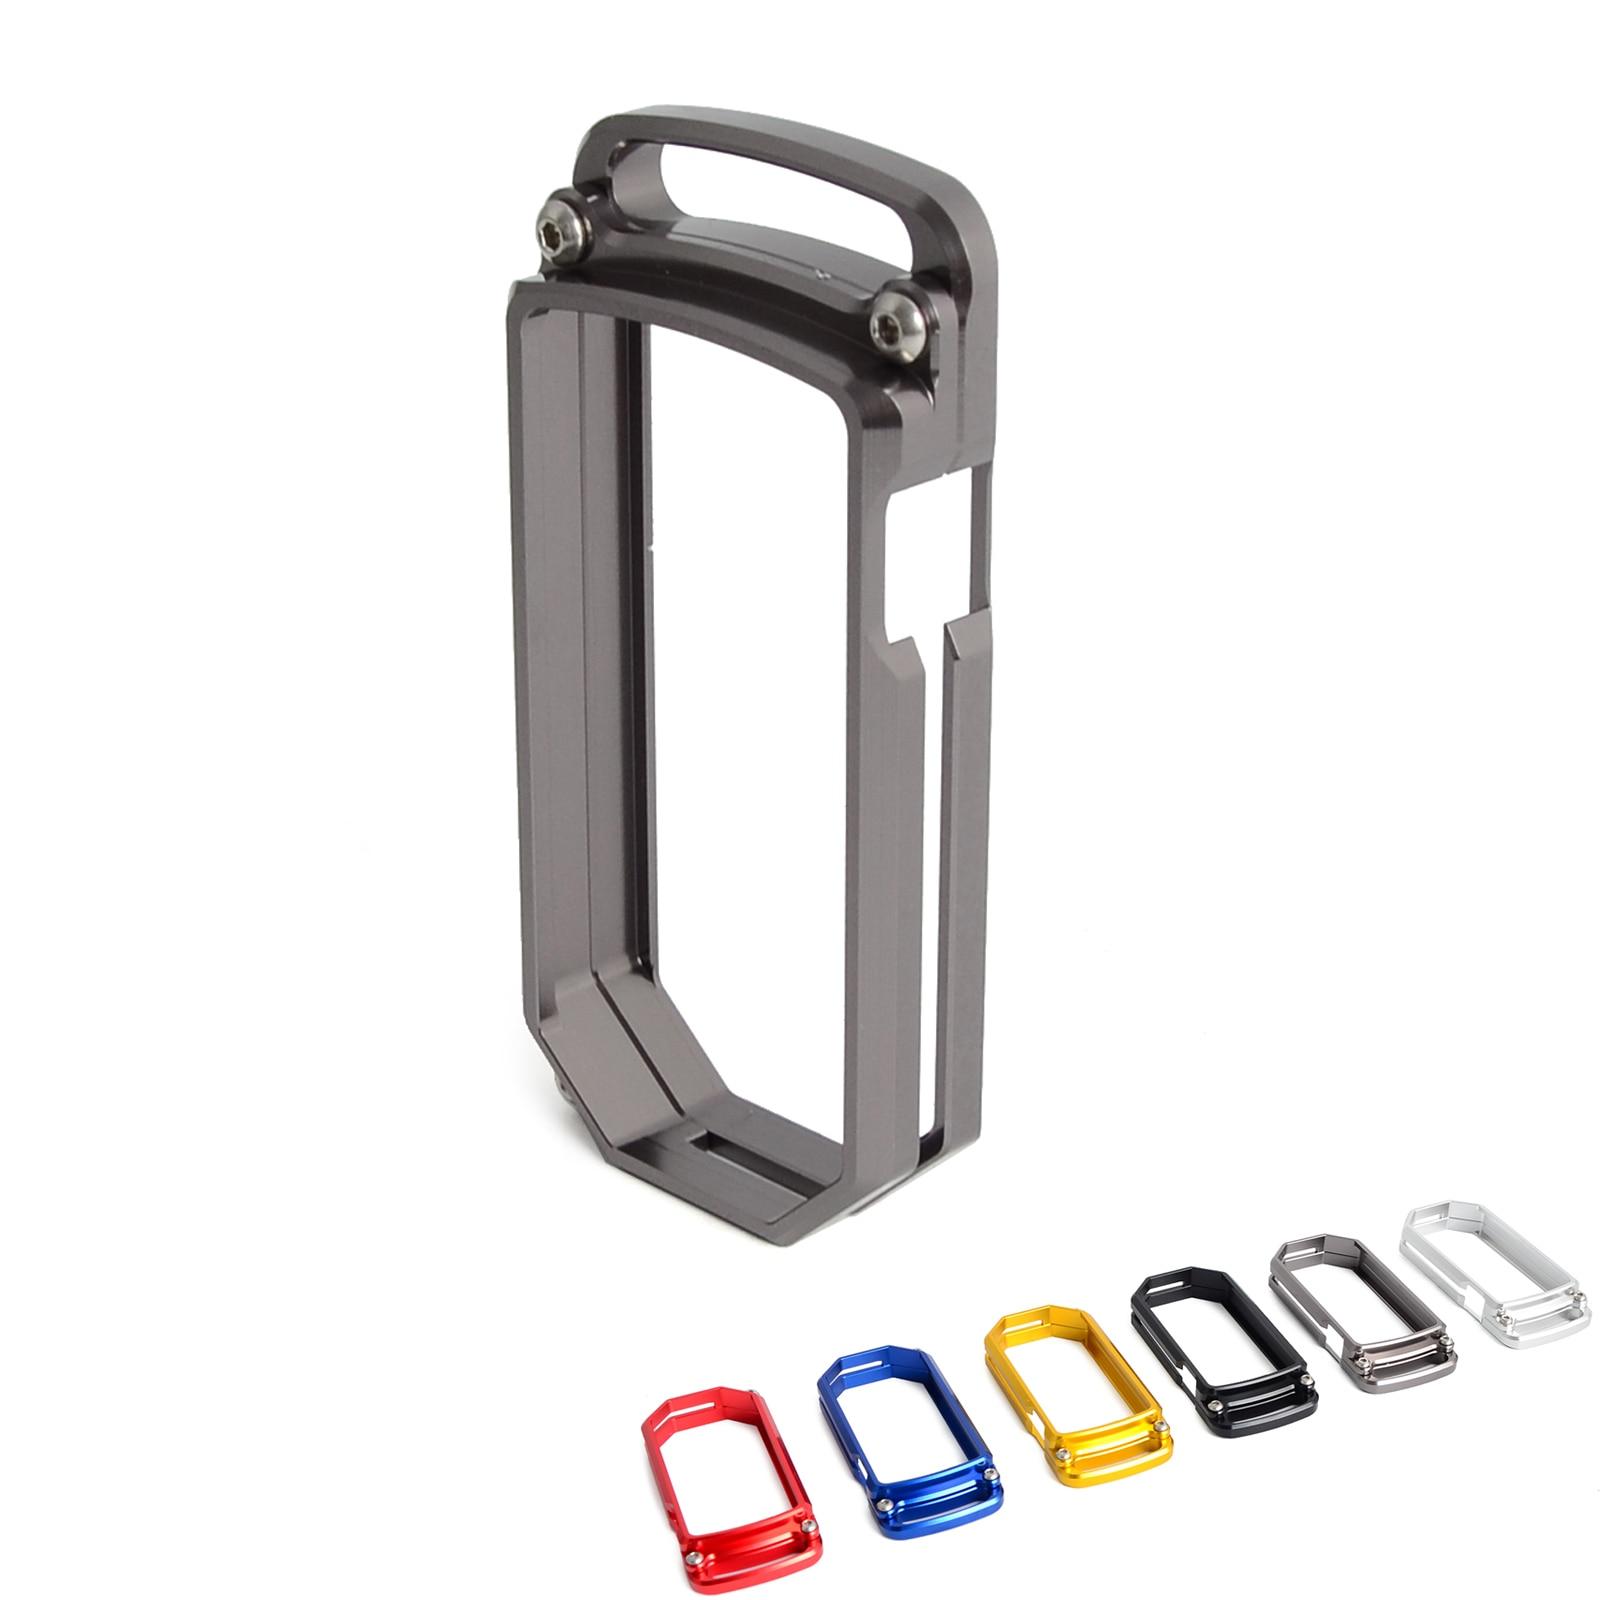 CNC Key Case SMART KEY COVER for Ducati  Diavel  2011-2016 ALL MODELS  Multitrada 1200/Multitrada 1200 S 2010-2014 Motorcycle cnc key case smart key cover for ducati diavel 2011 2016 multitrada 1200 1200s mts1200 2010 2014 new